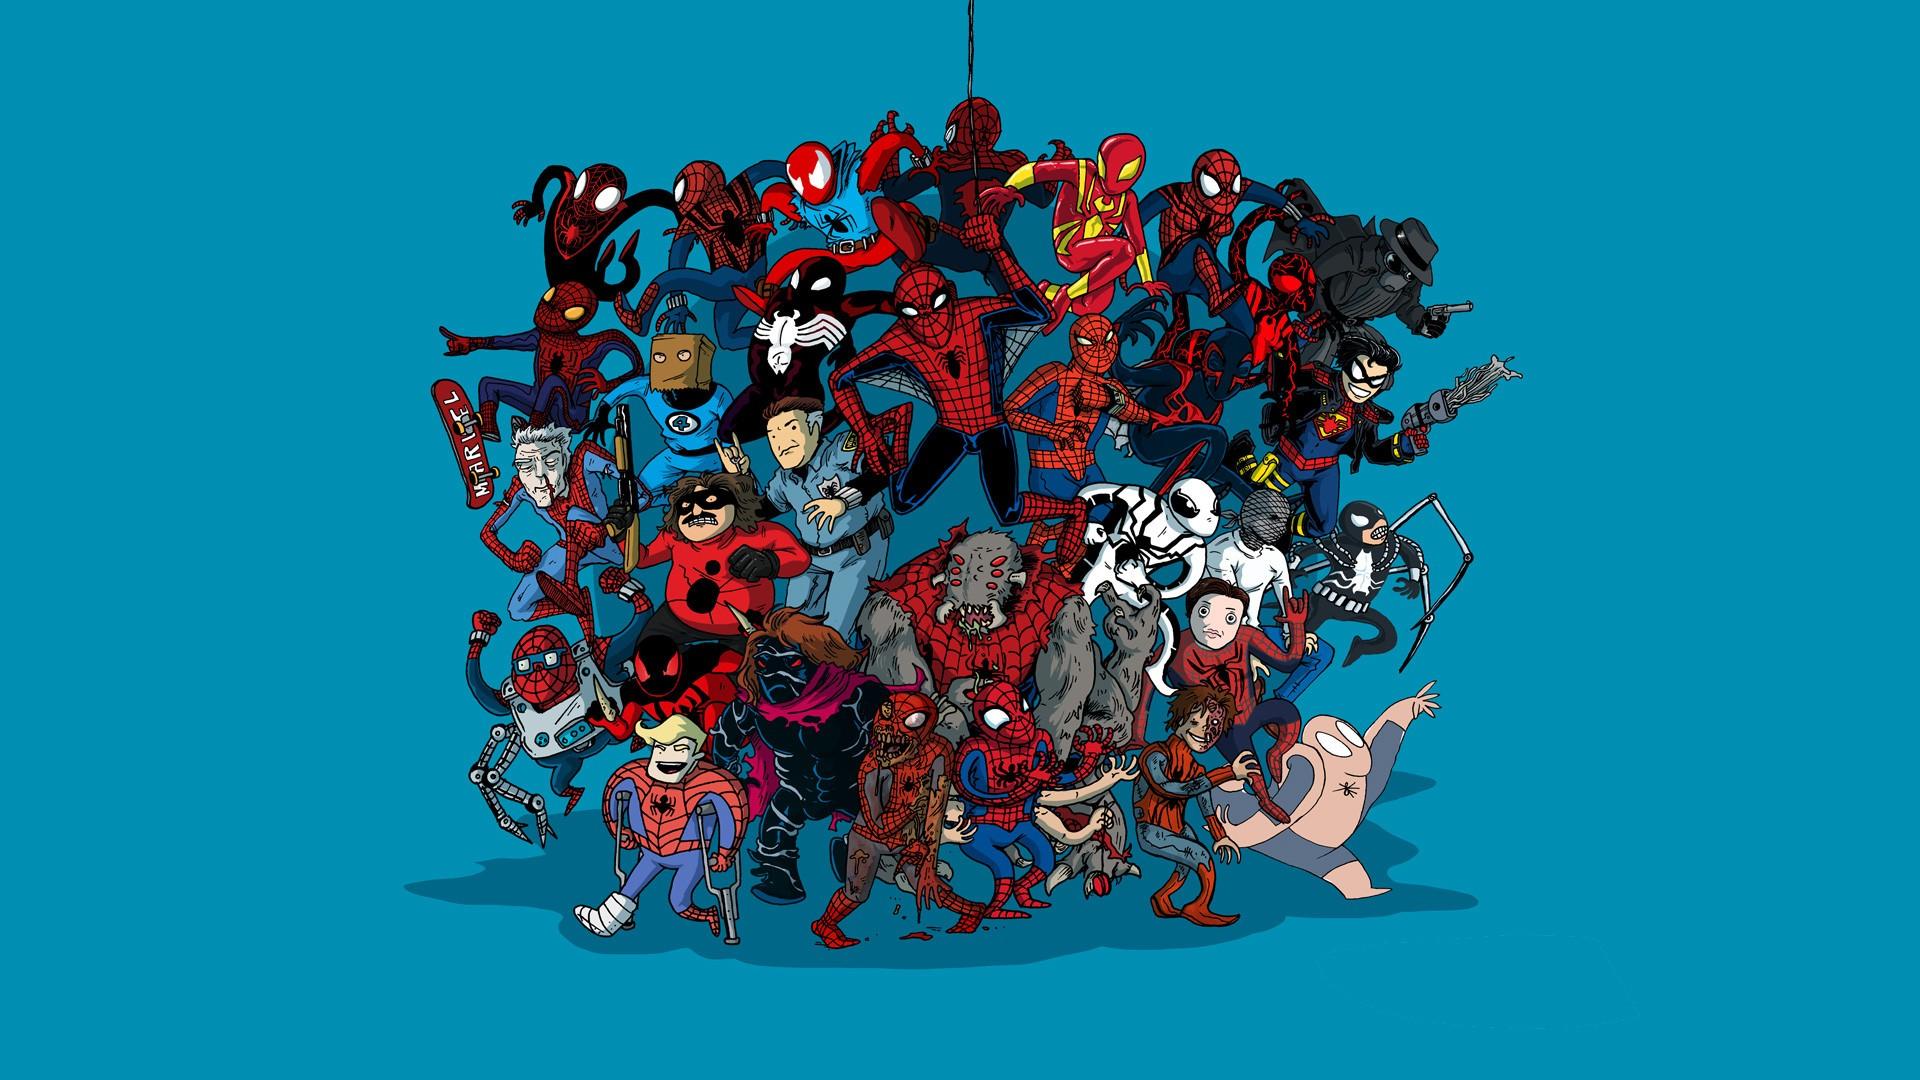 spider man wallpaper download free stunning full hd wallpapers